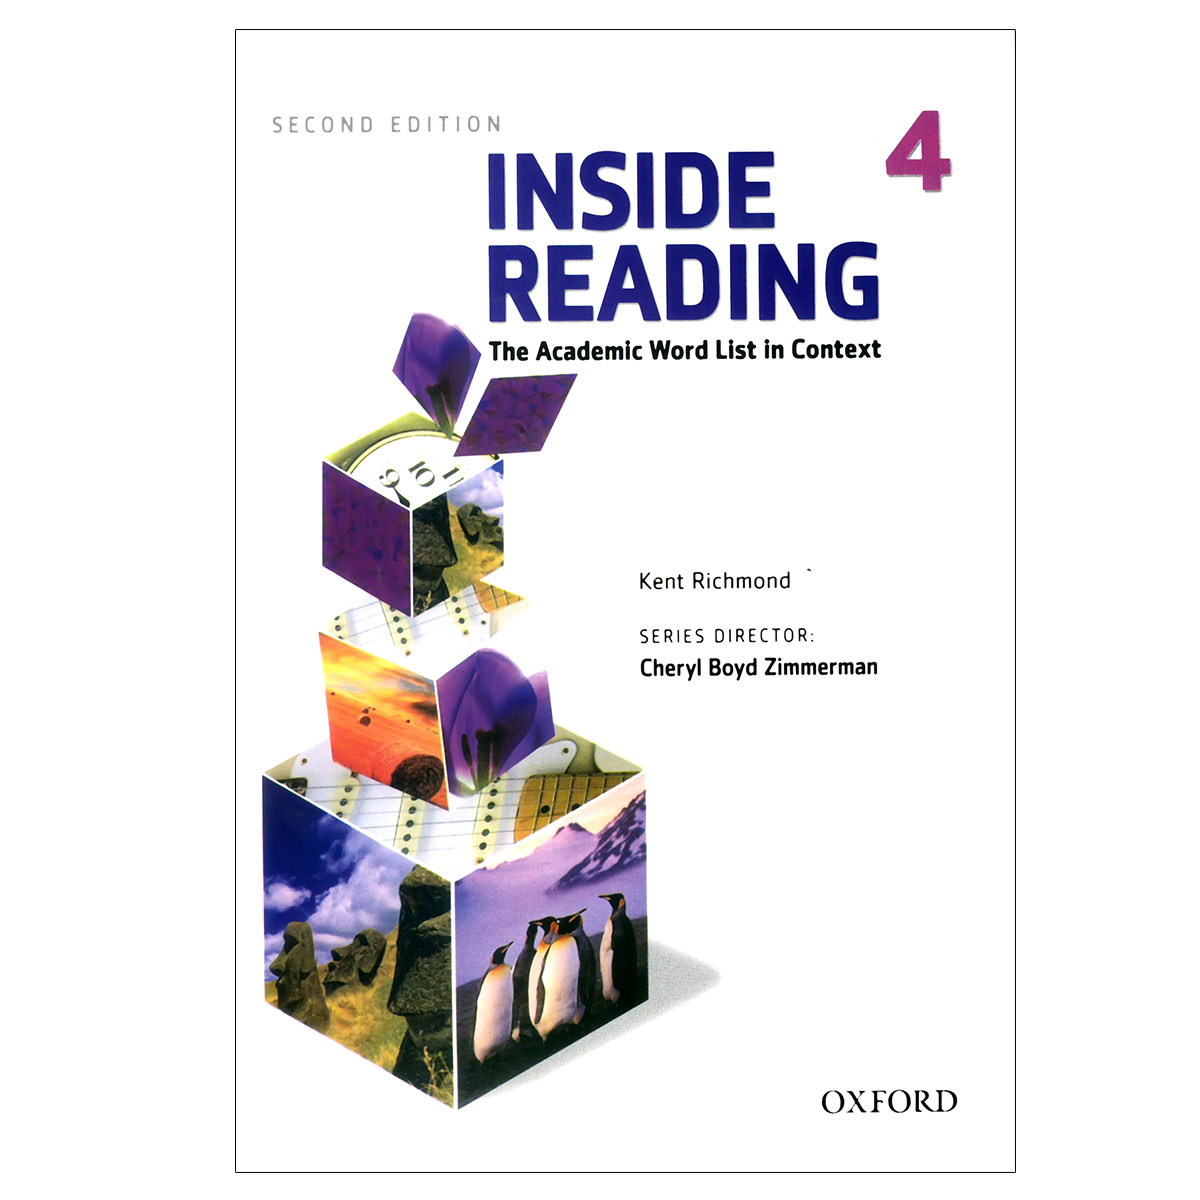 کتاب Inside Reading 4 اثر kent richmond انتشارات oxford university press